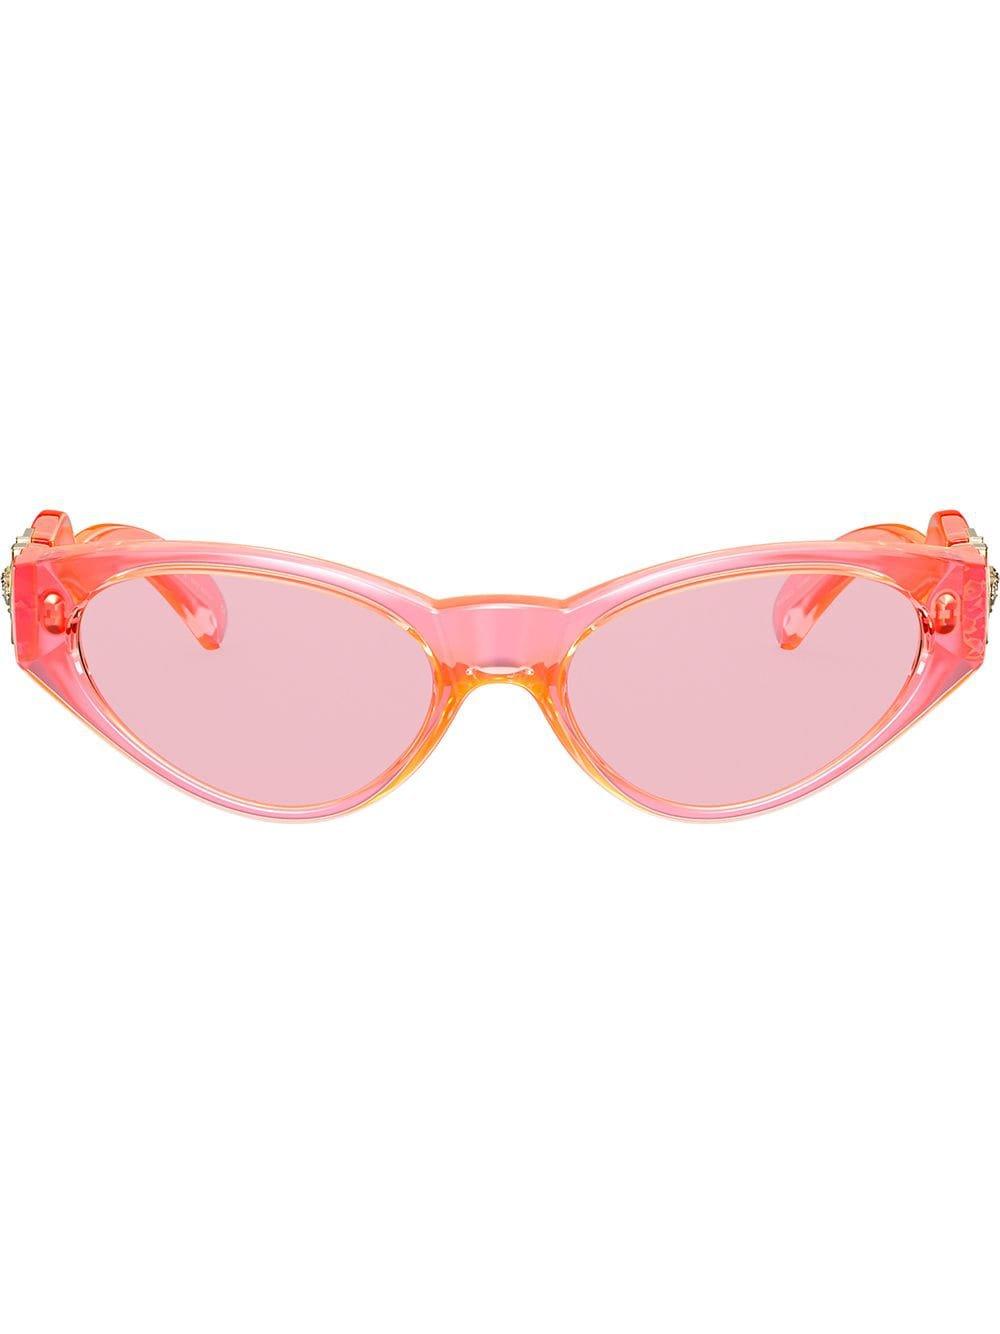 Versace Eyewear Oval Frames Sunglasses